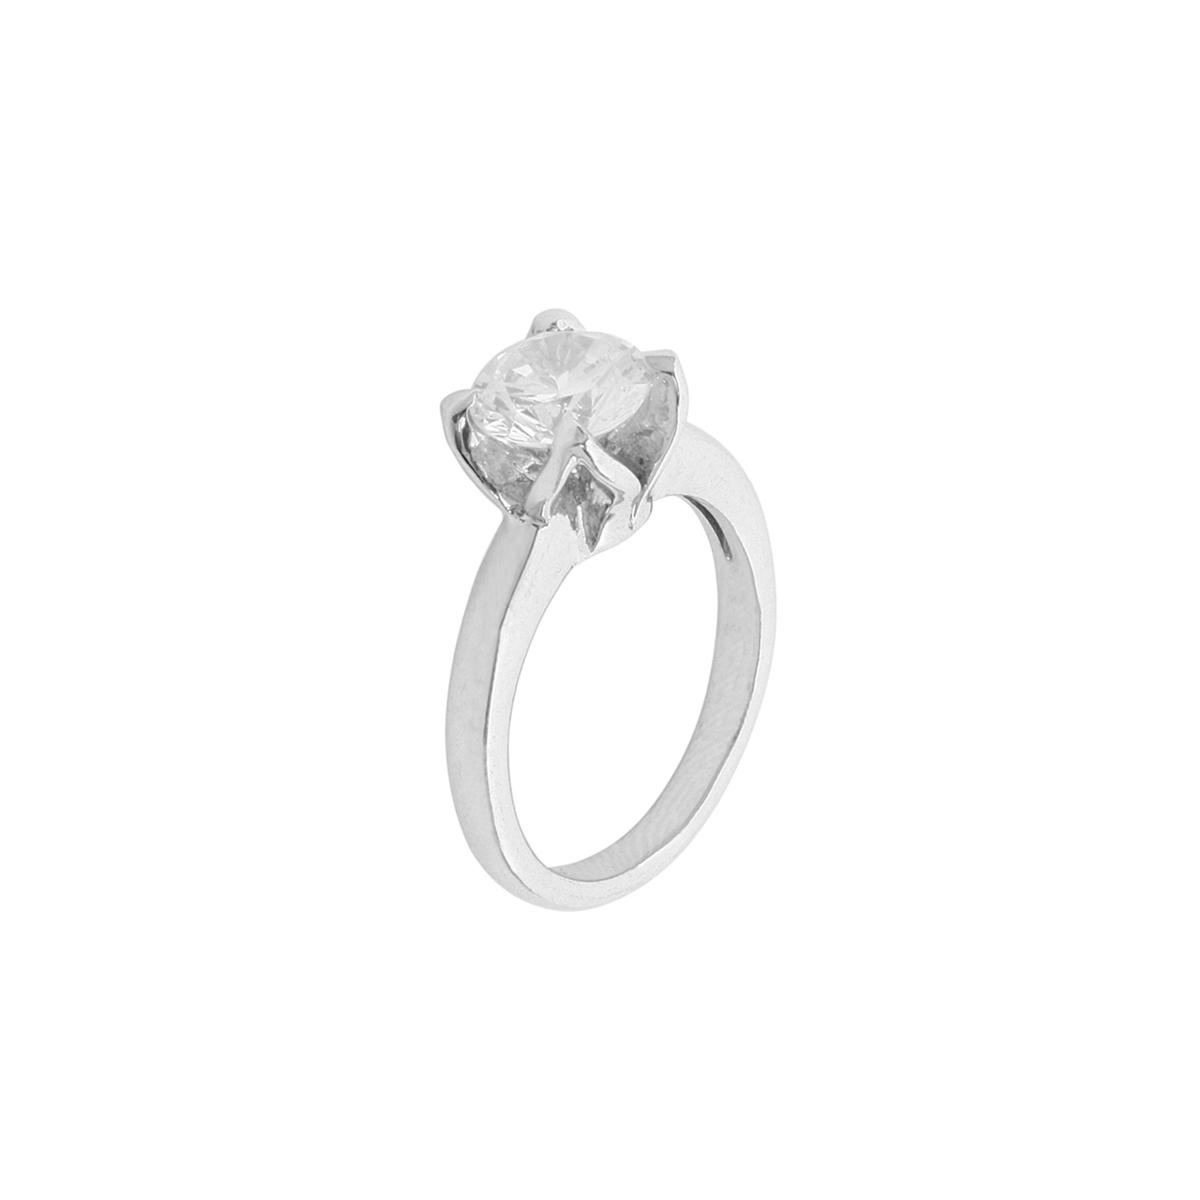 Concave Diamond Solitaire Ring